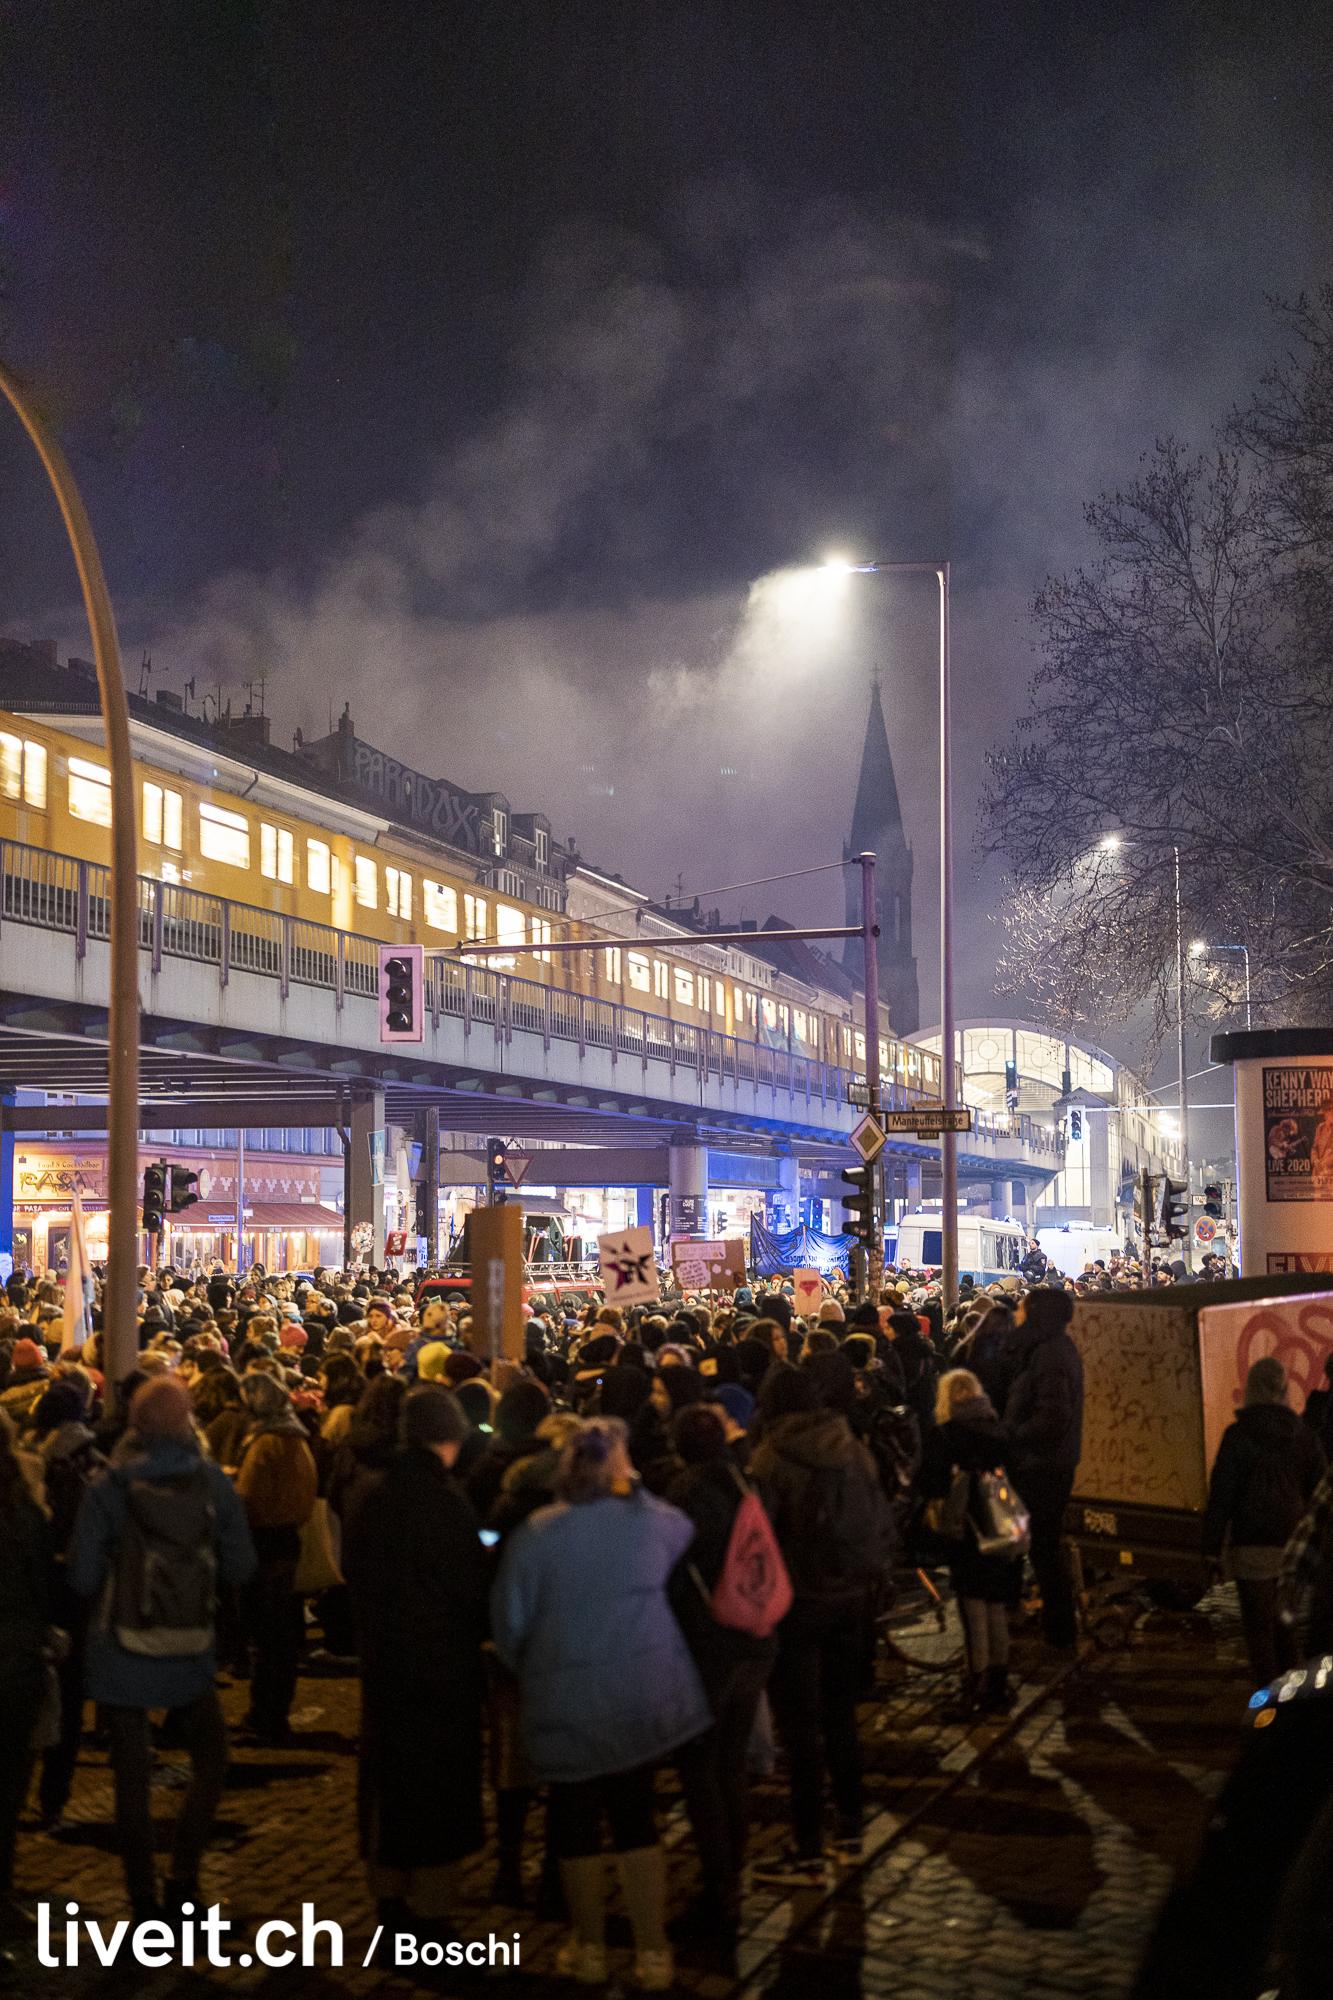 Berlin impressions (liveit.ch/boschi)